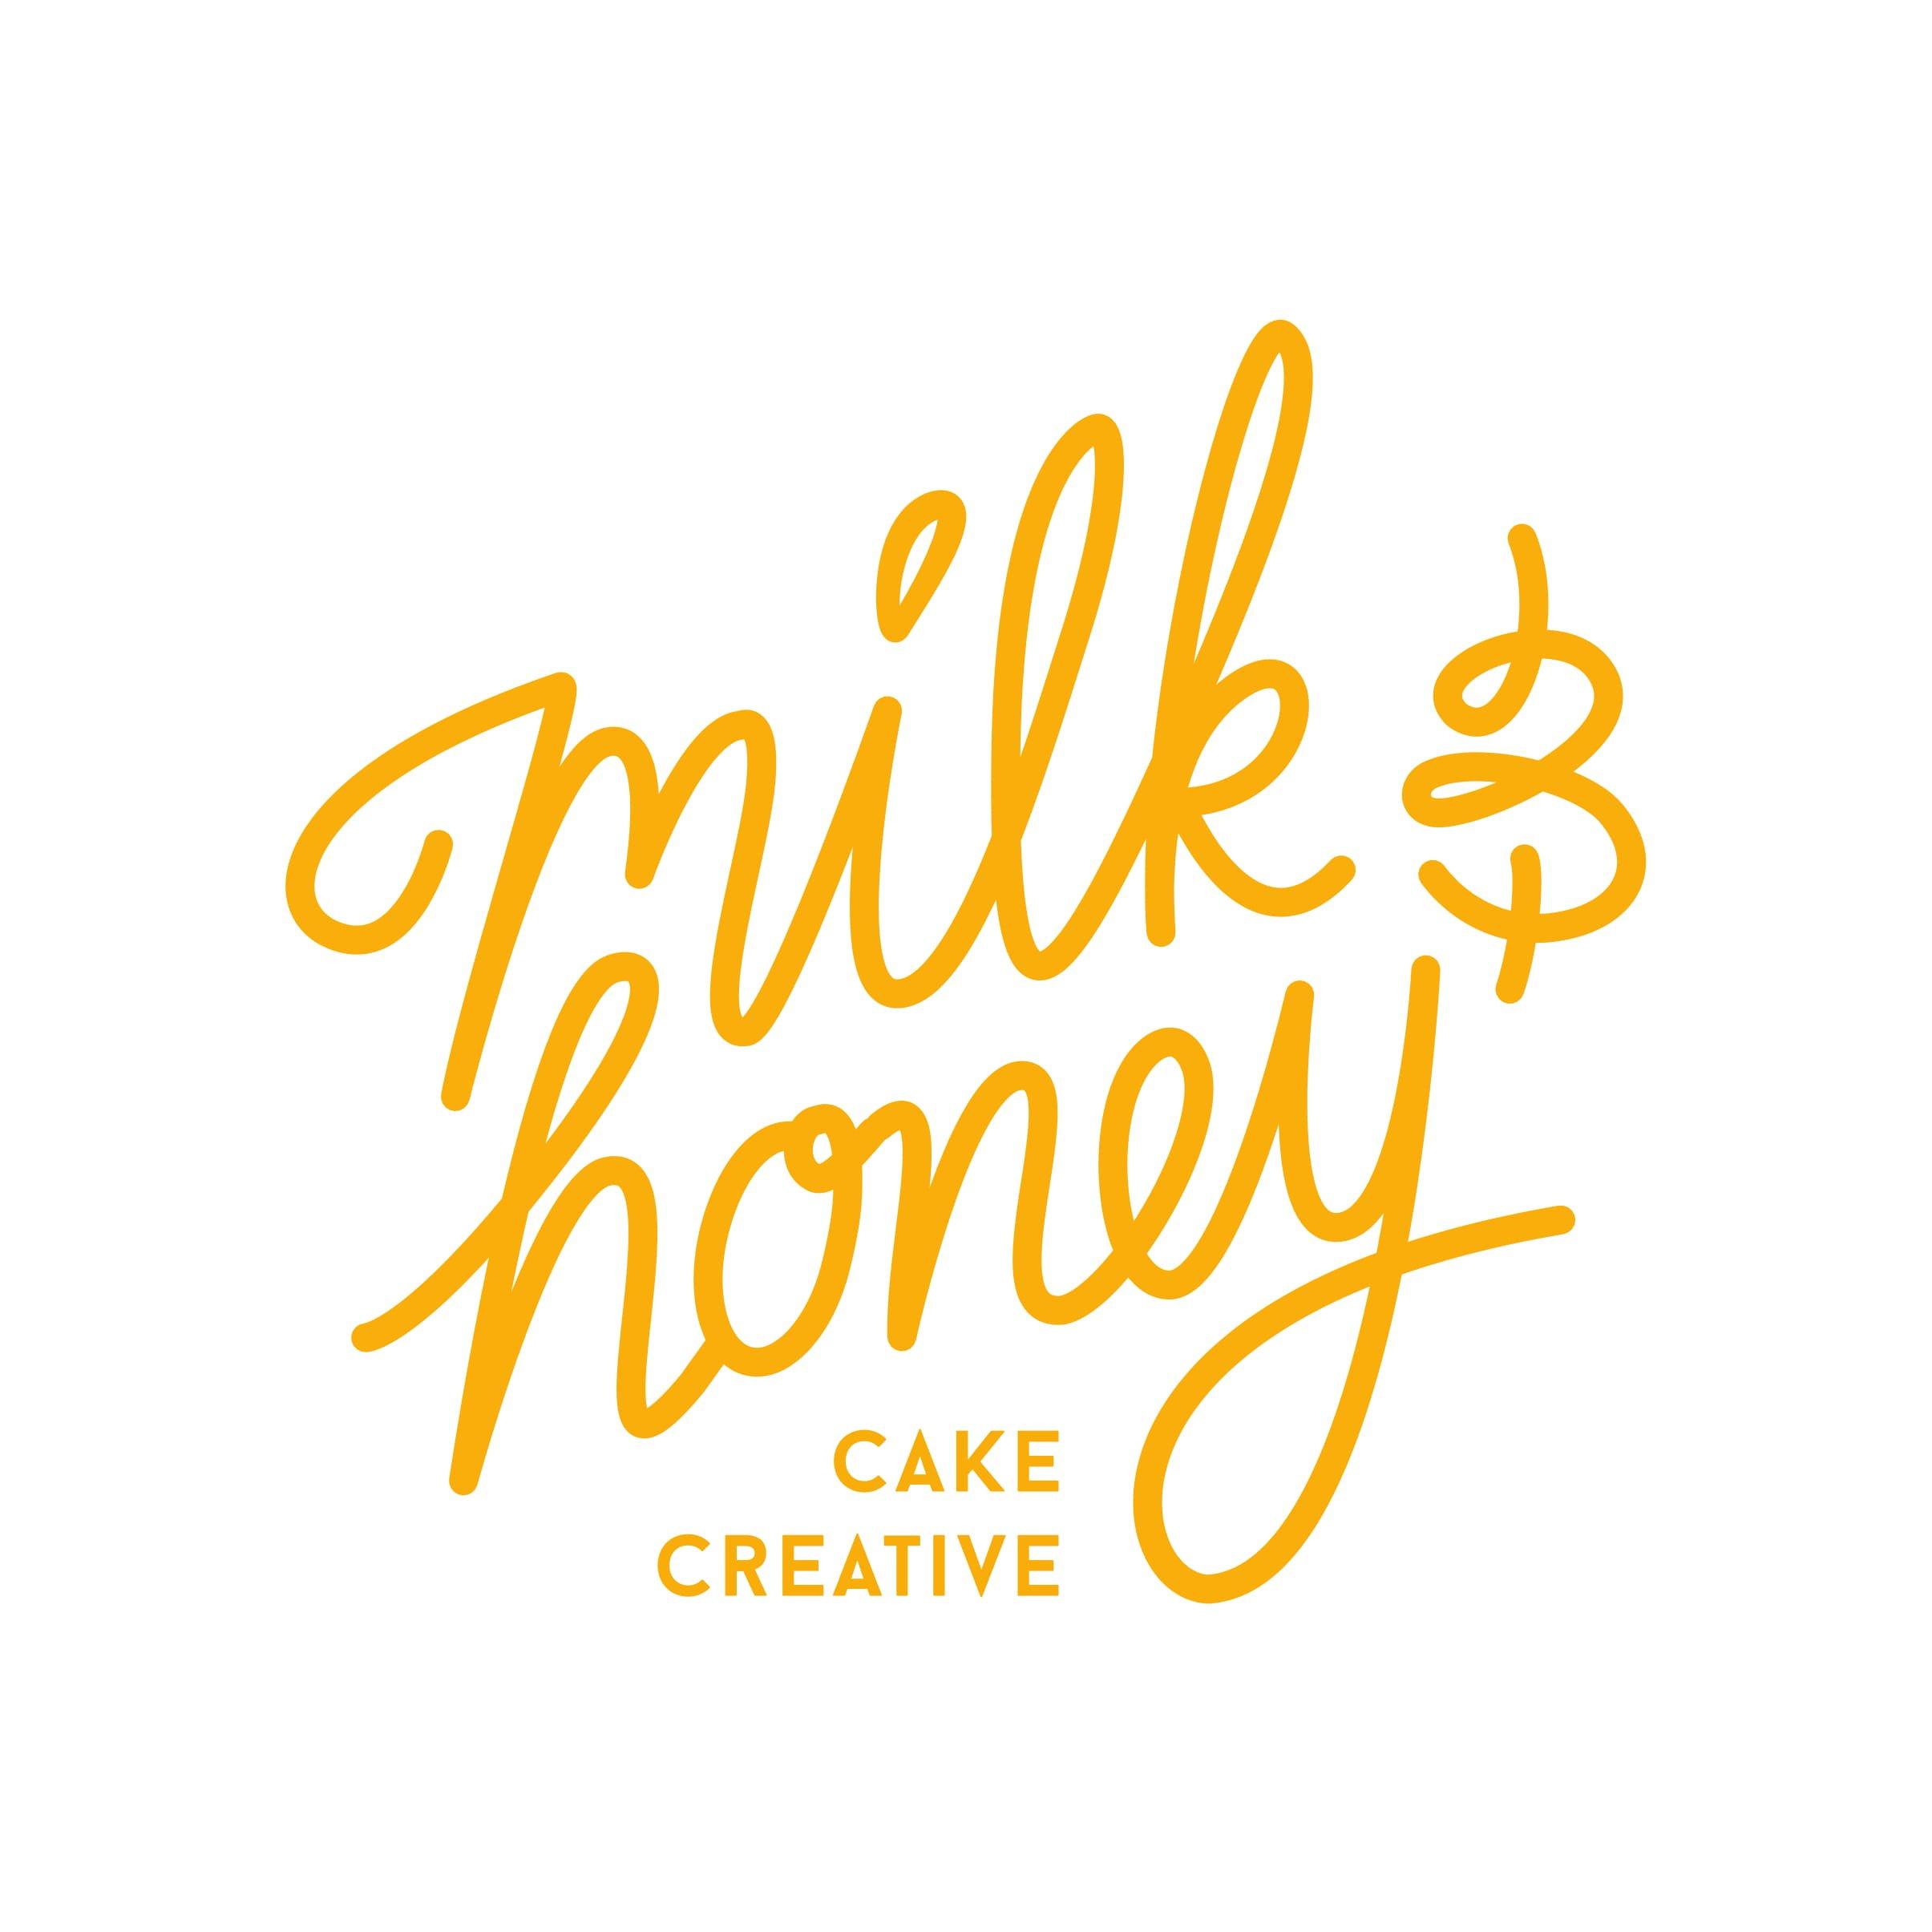 Milk and Honey Cake Creative - Tweed Coast Weddings